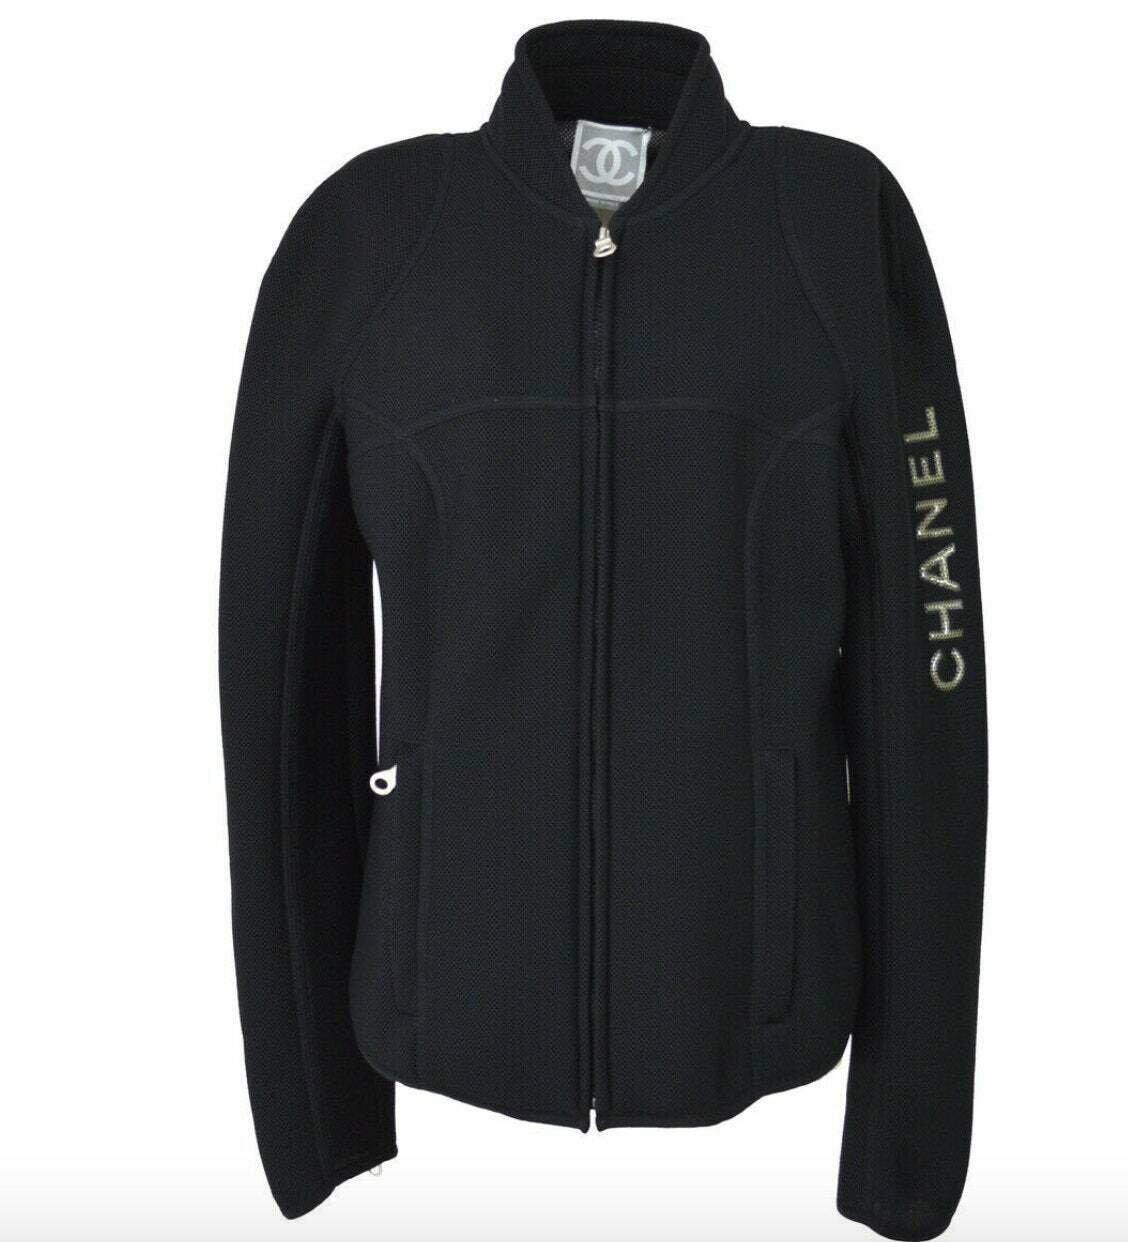 Vintage CHANEL Monogram Logo CC Black Mesh Jacket Puffer Sport Coat Bomber eu 44  us S M L